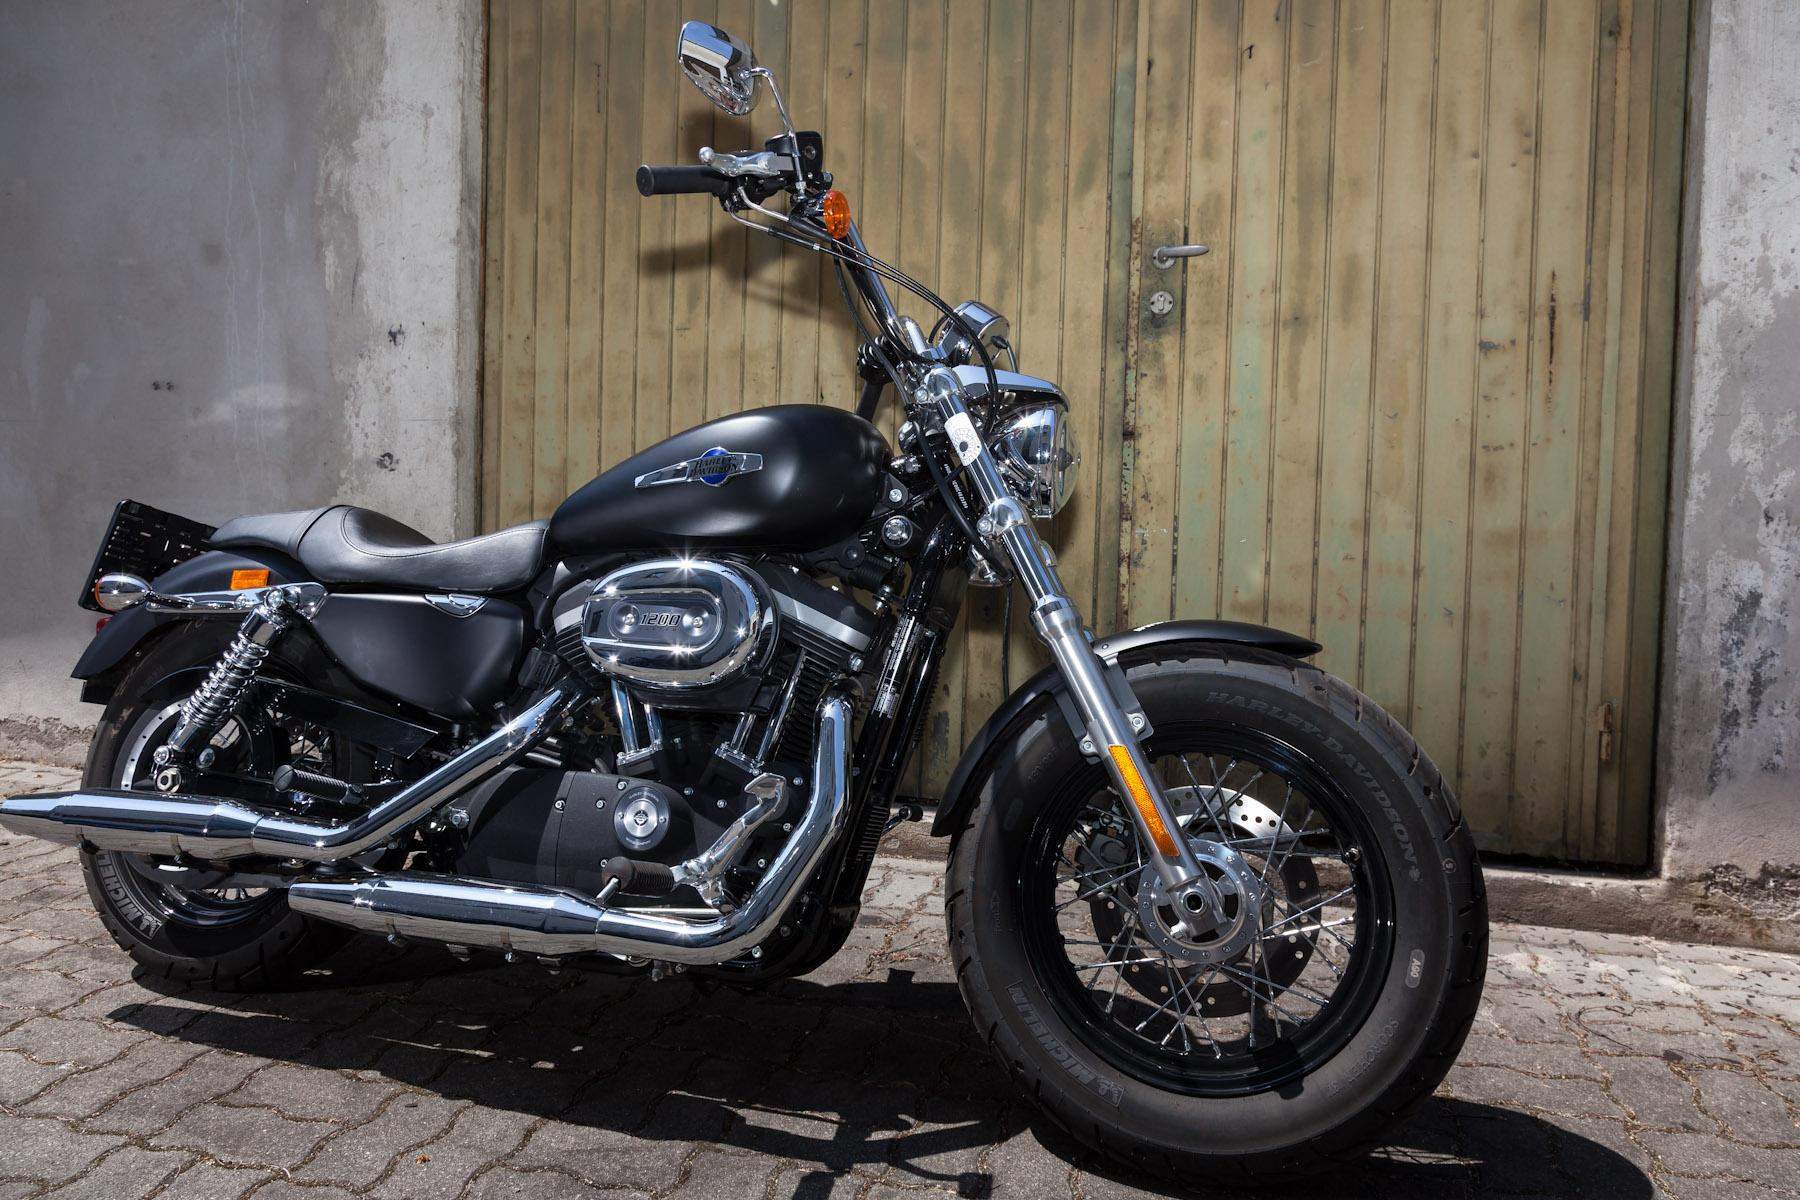 Harley-davidson sportster iron 833 gallery